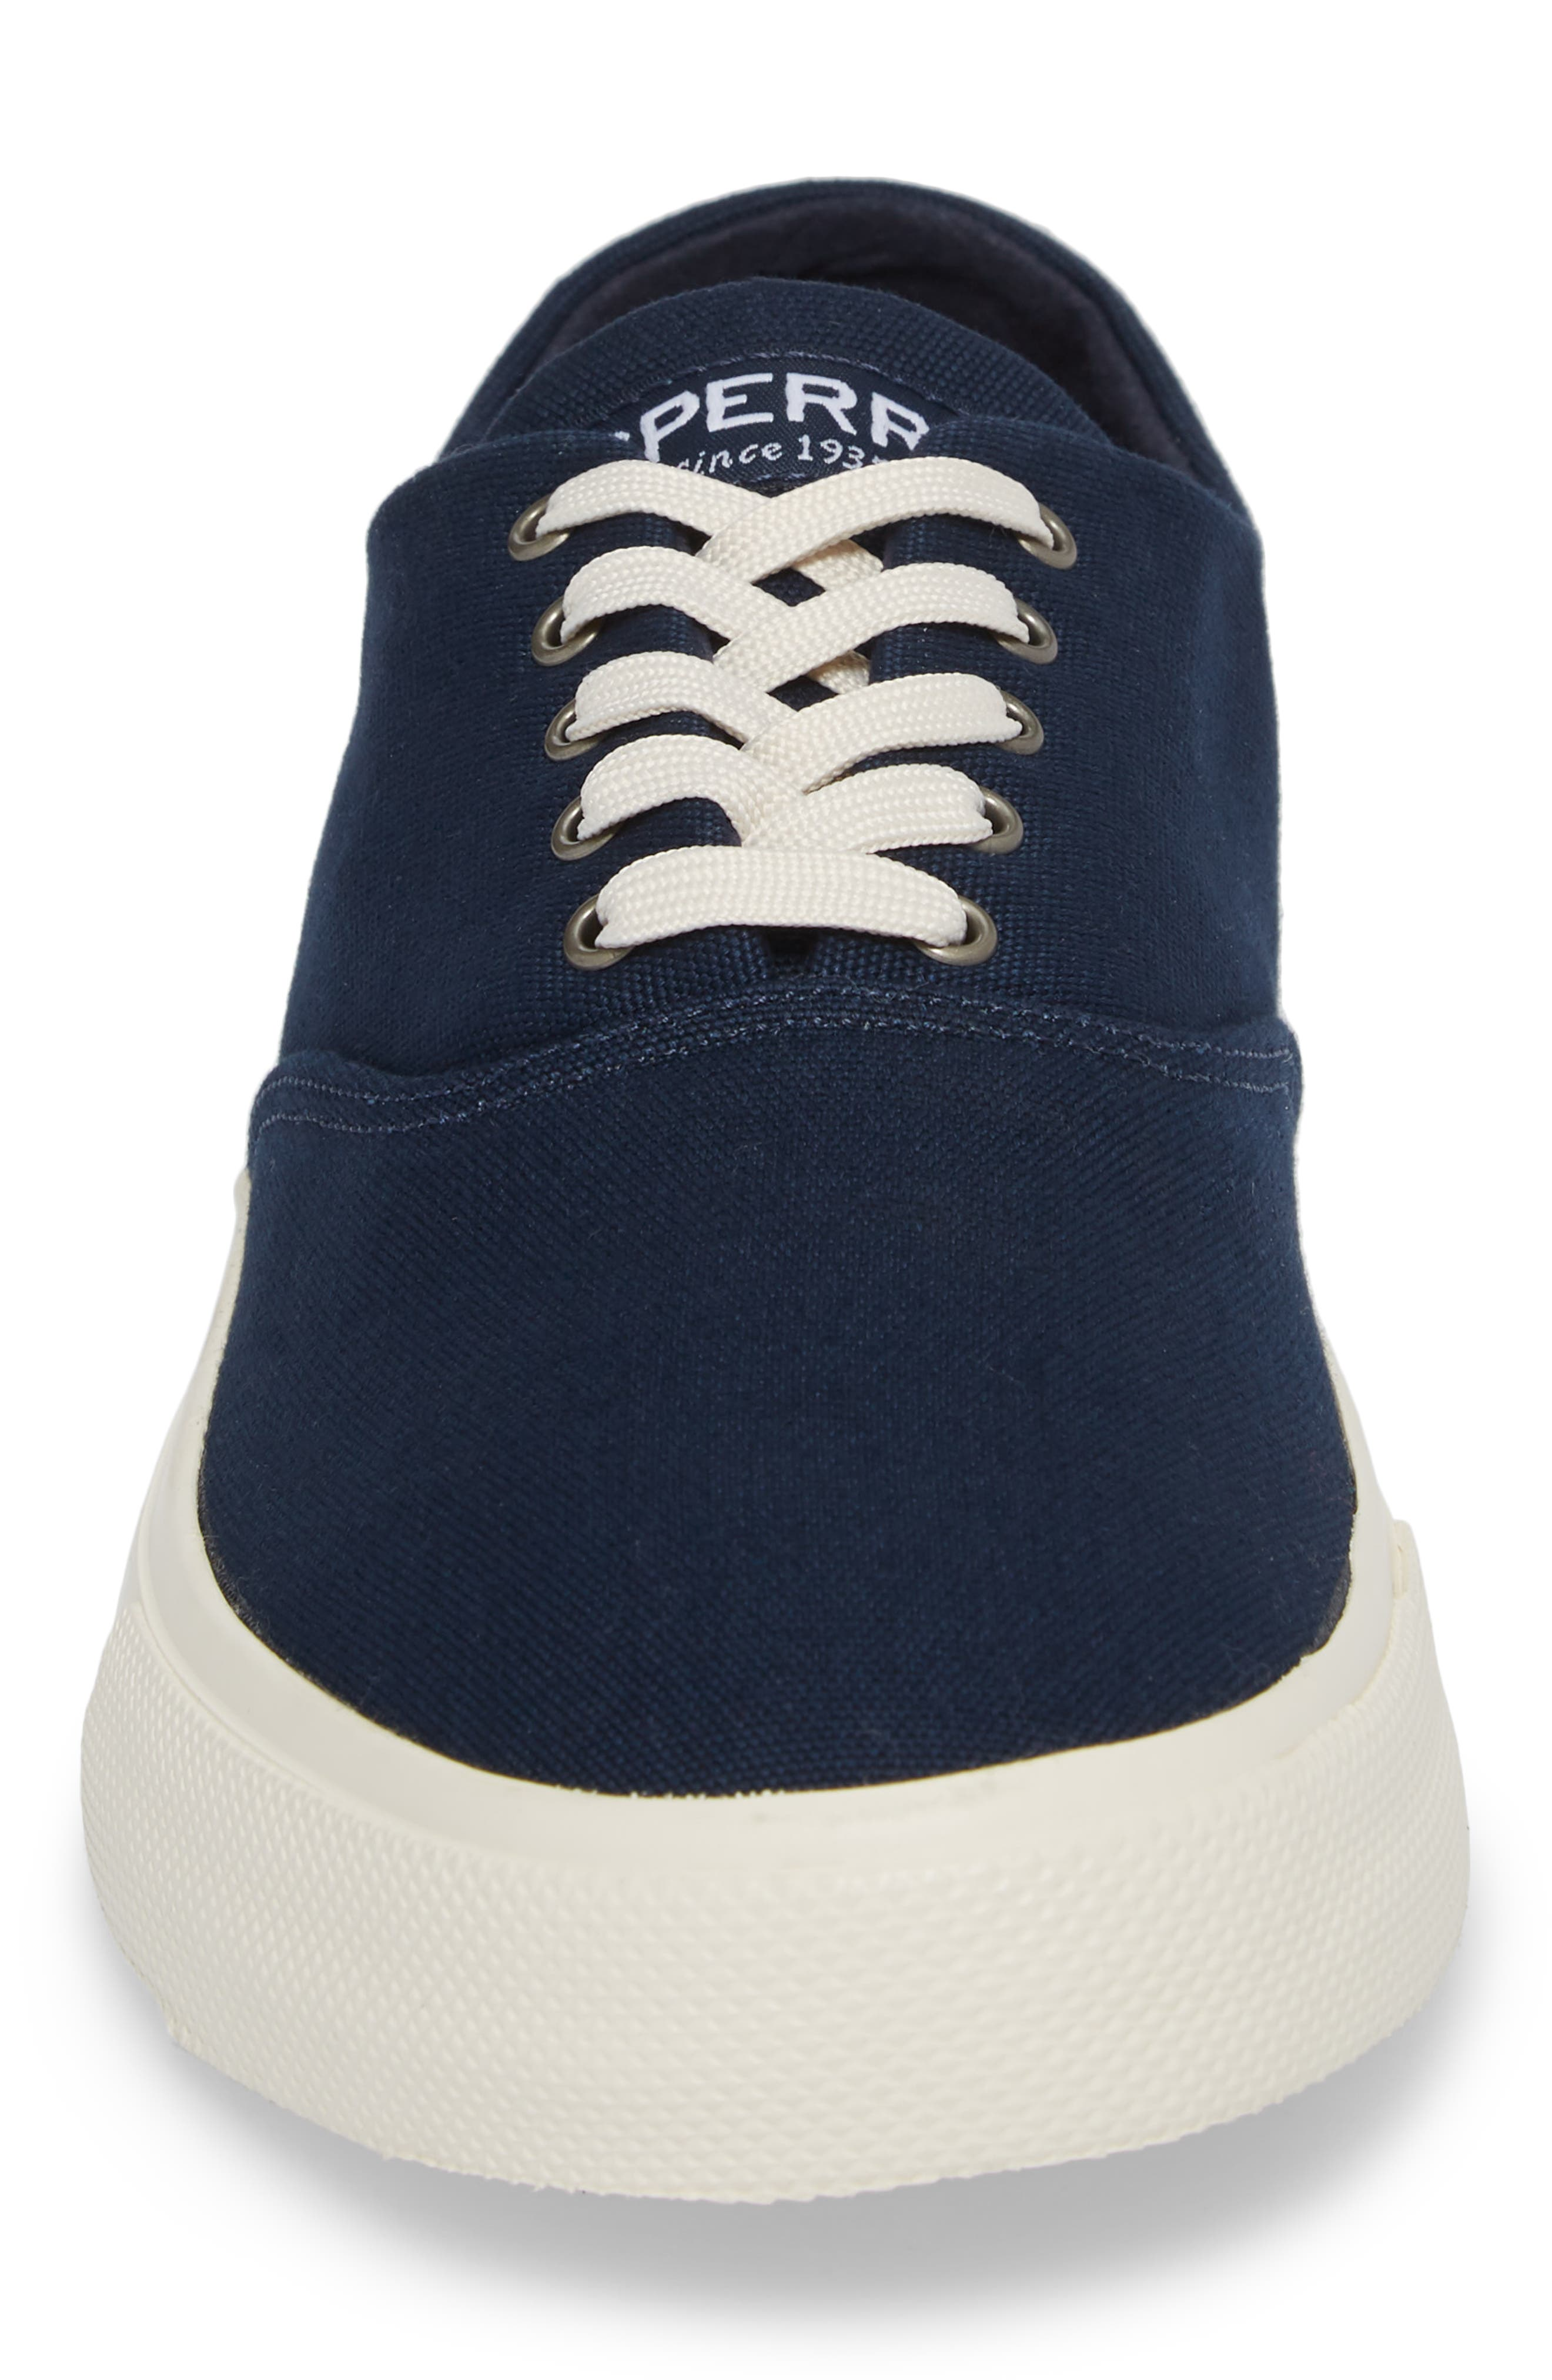 Captain's CVO Sneaker,                             Alternate thumbnail 4, color,                             Navy Fabric